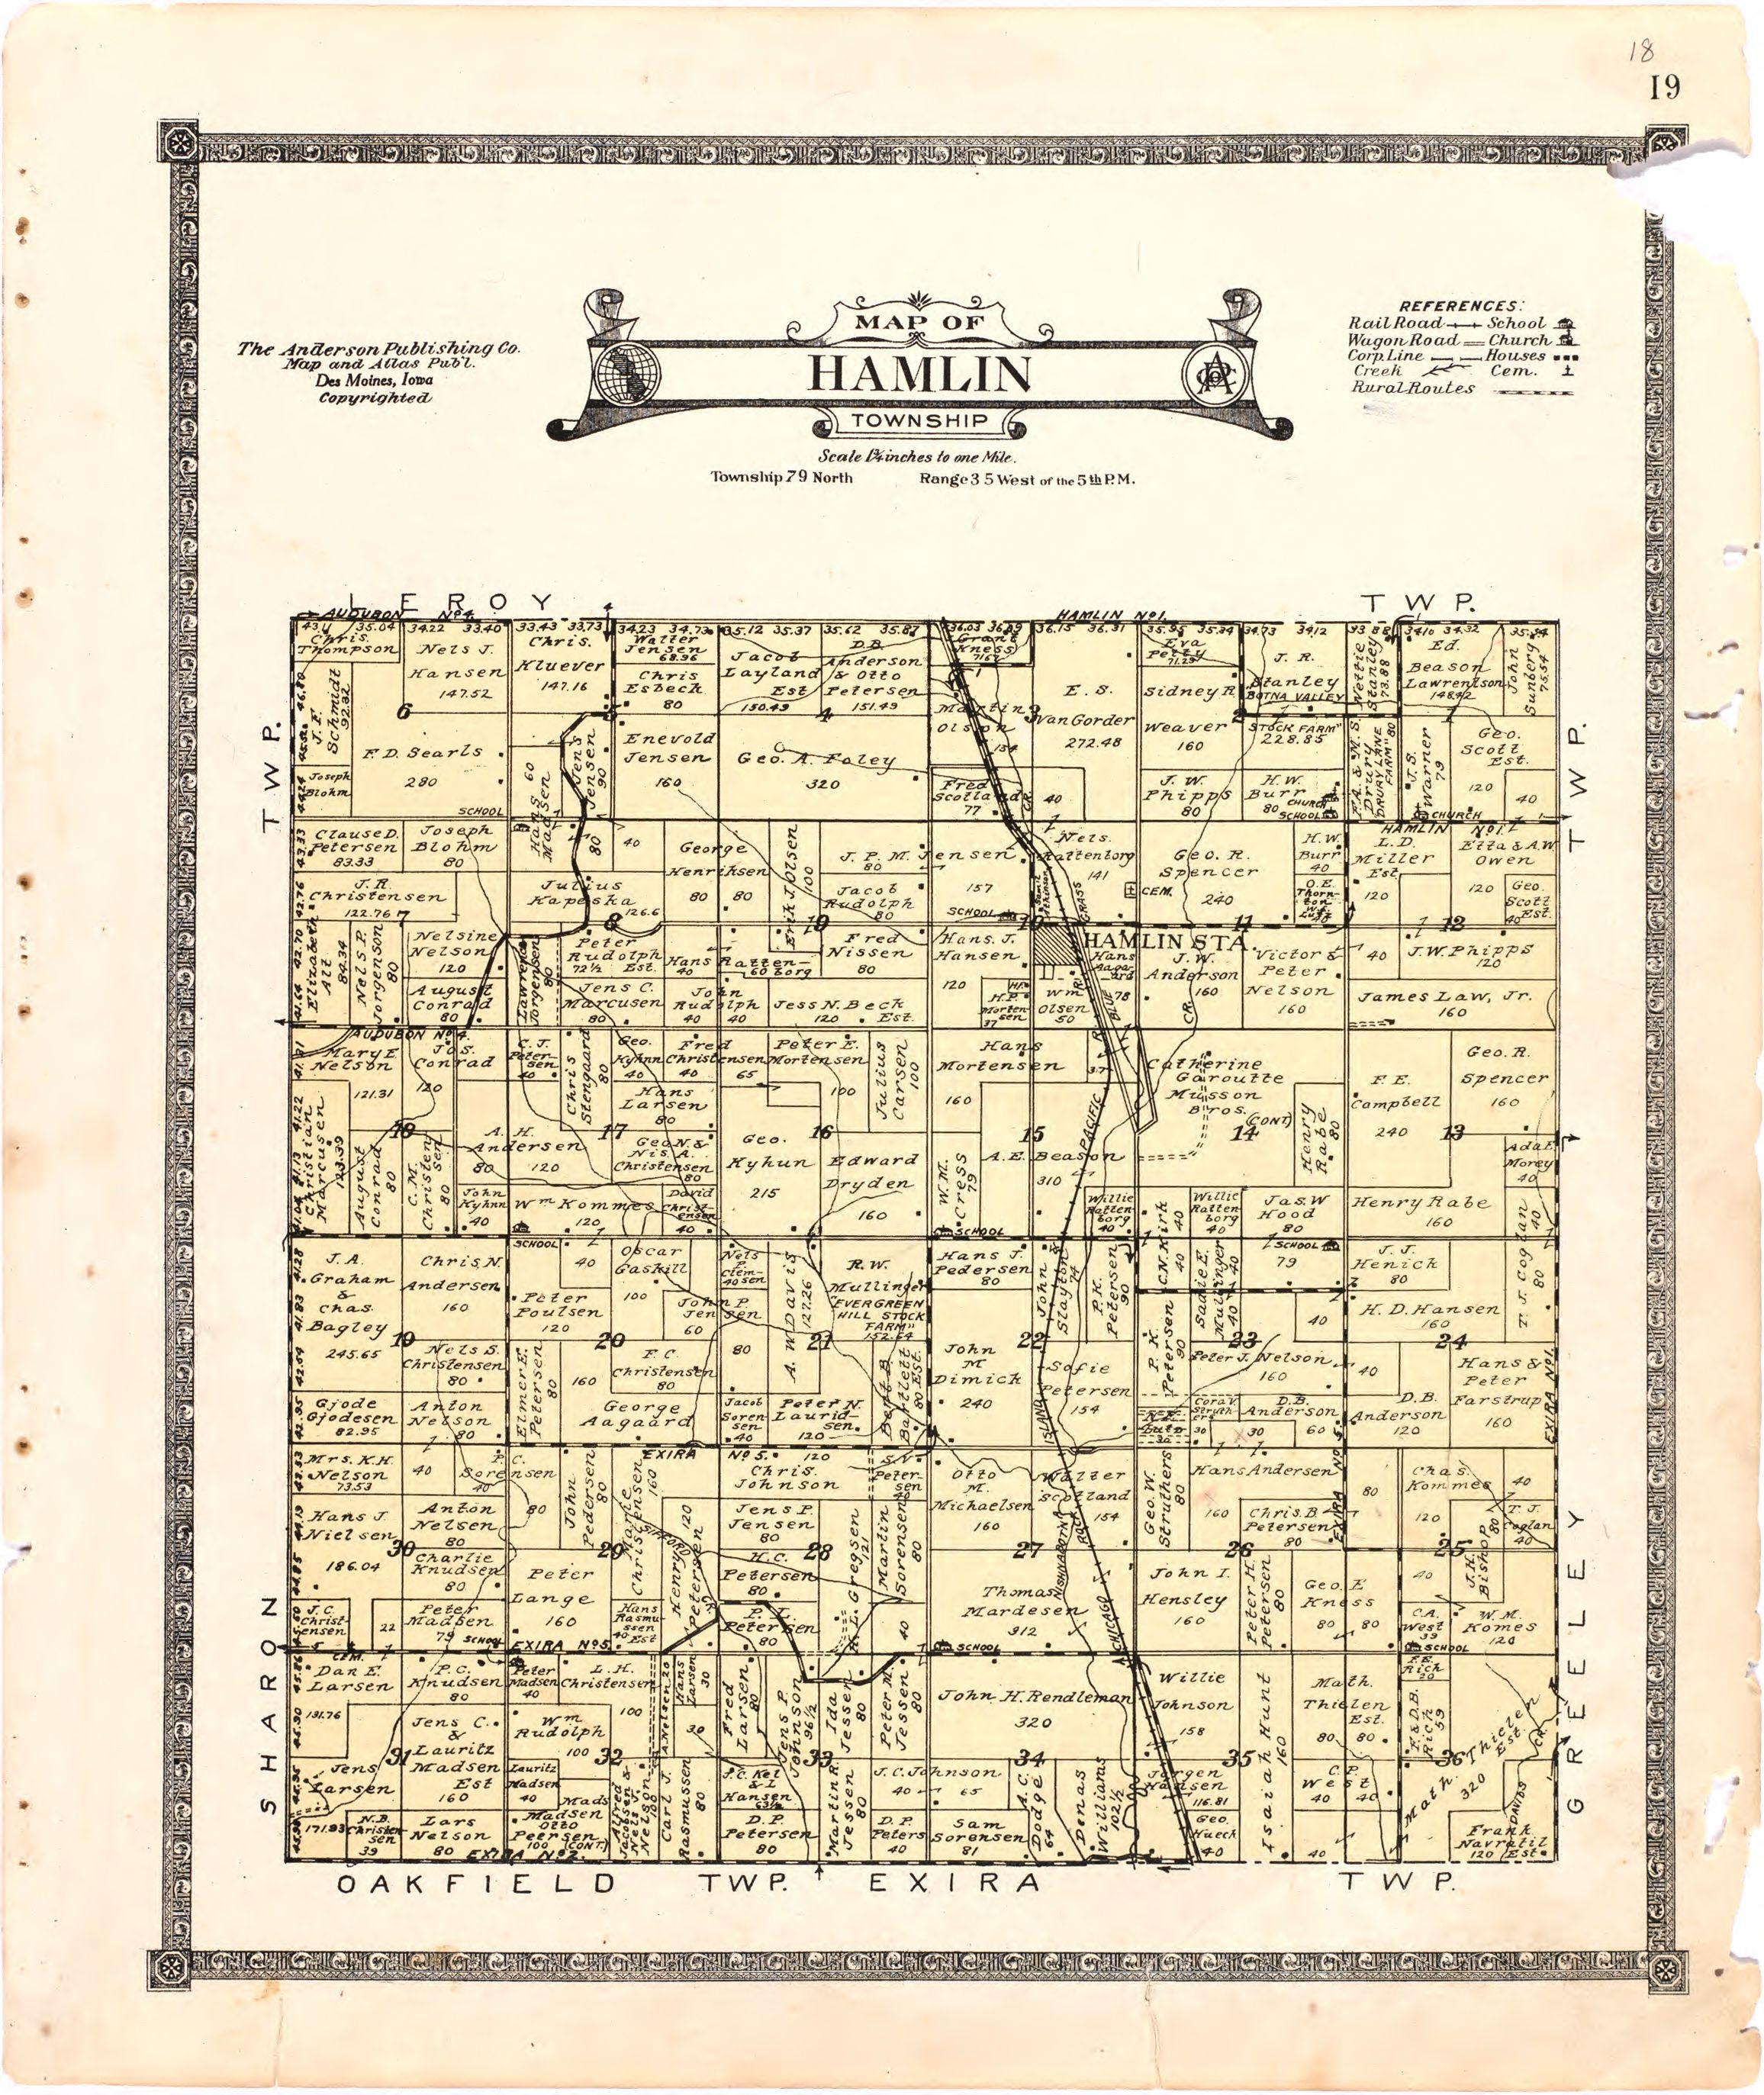 1921 Farm Map of Hamlin Township, Audubon County, Iowa